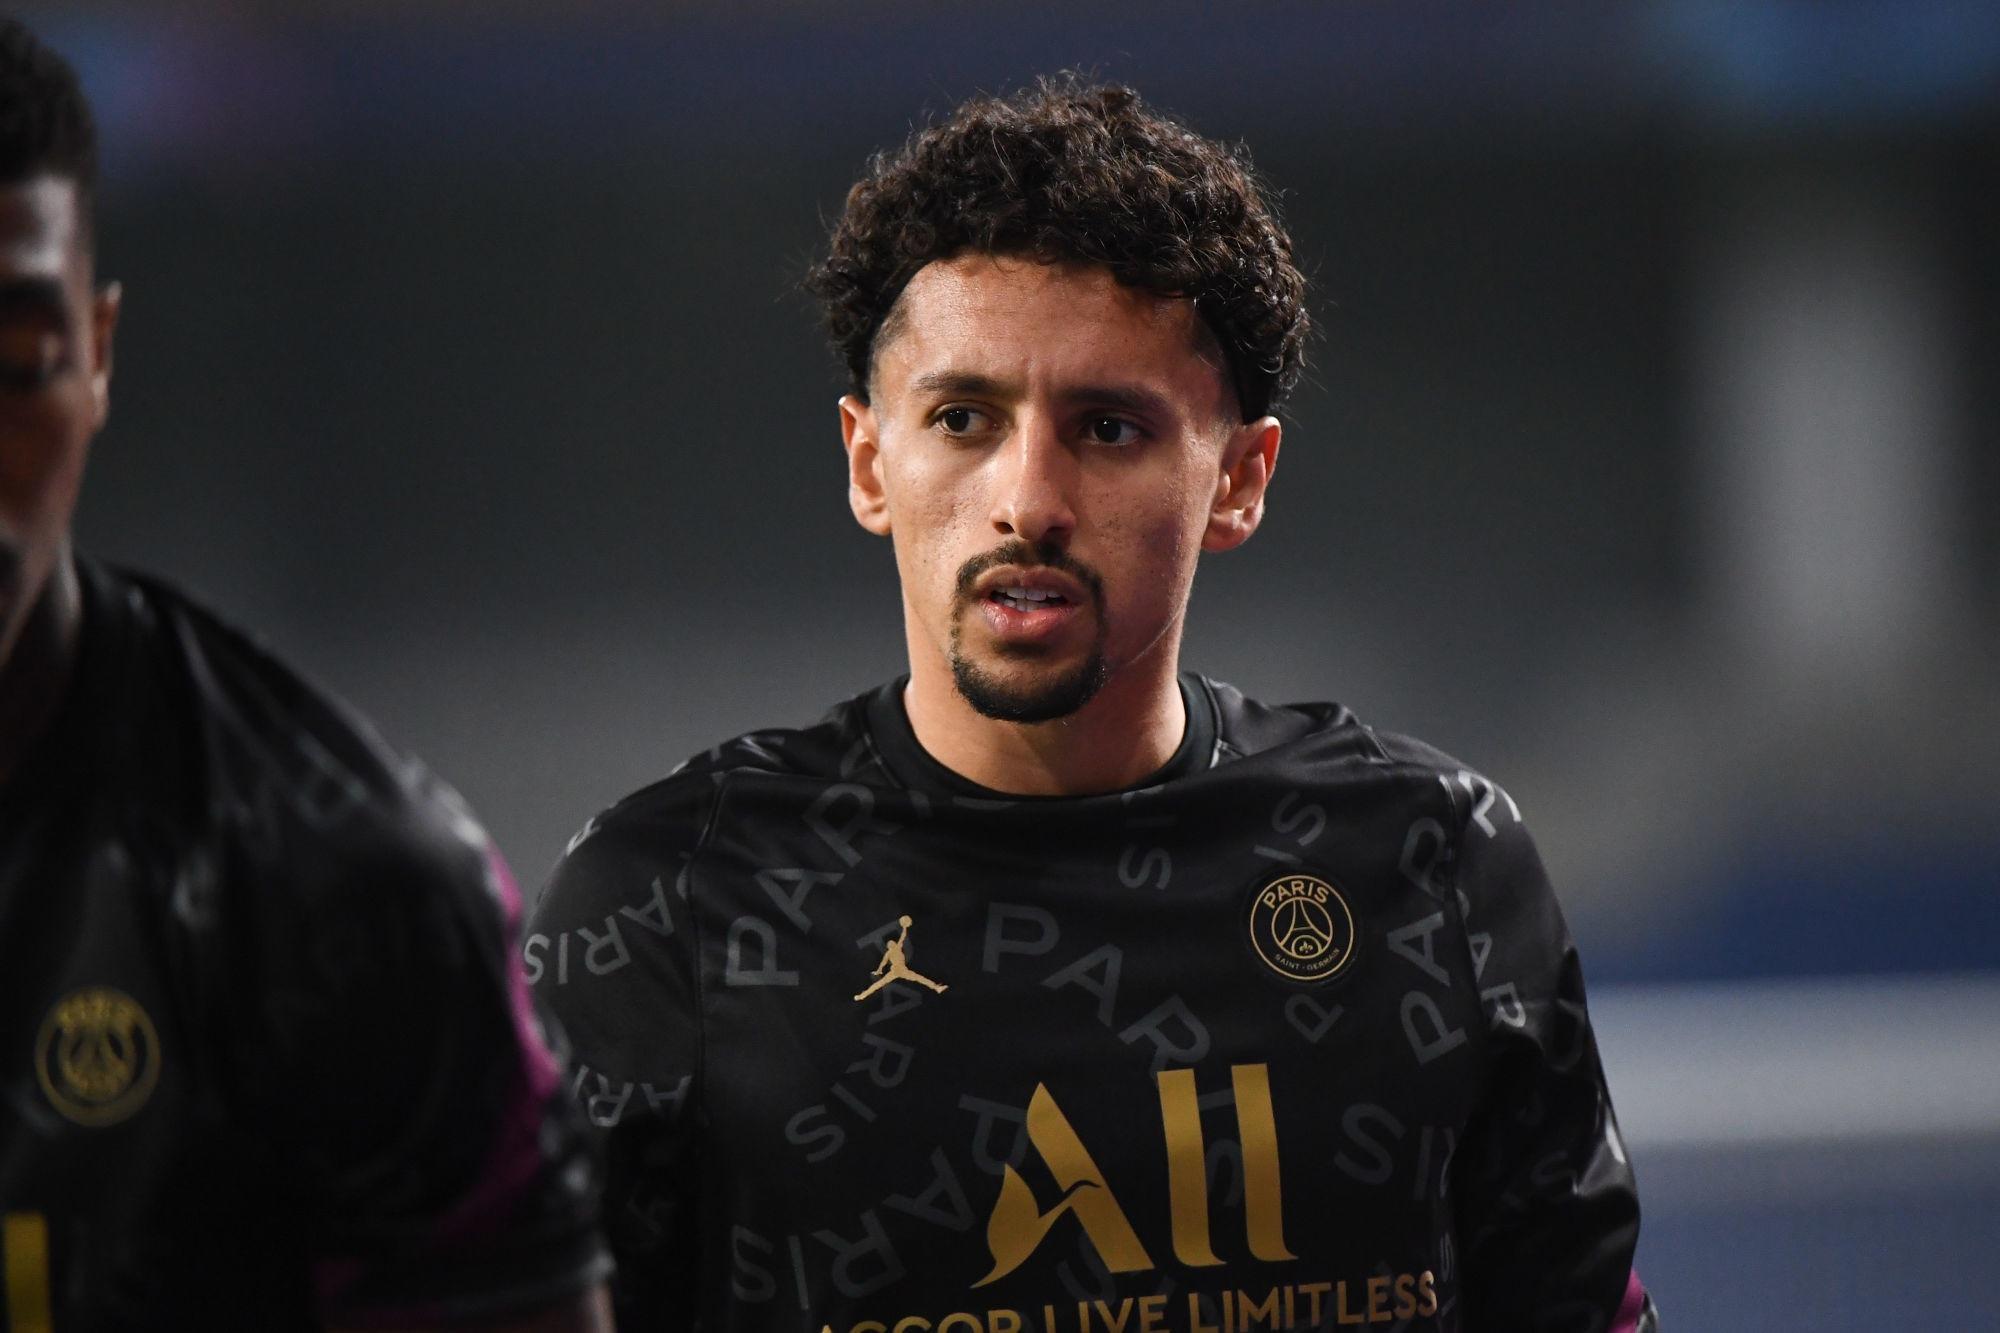 Metz/PSG - Marquinhos ne sera pas dans le groupe, explique L'Equipe